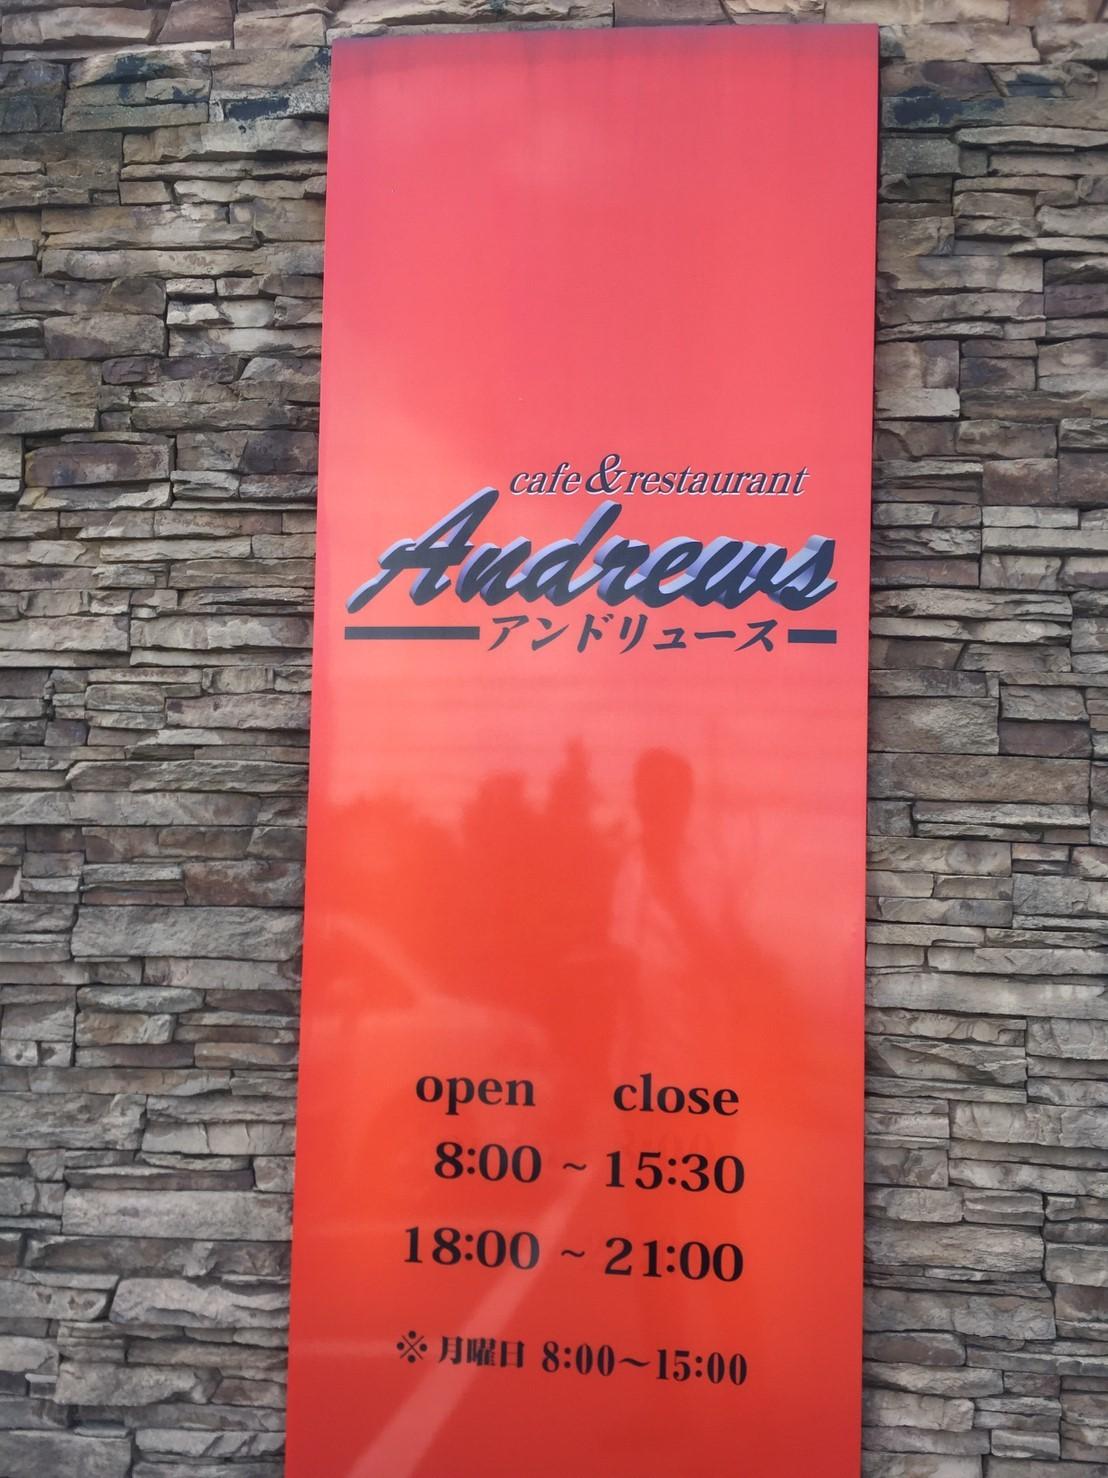 cafe & restaurant アンドリュース 日替わりランチ  ラス1和風ハンバーグ_e0115904_19303173.jpg